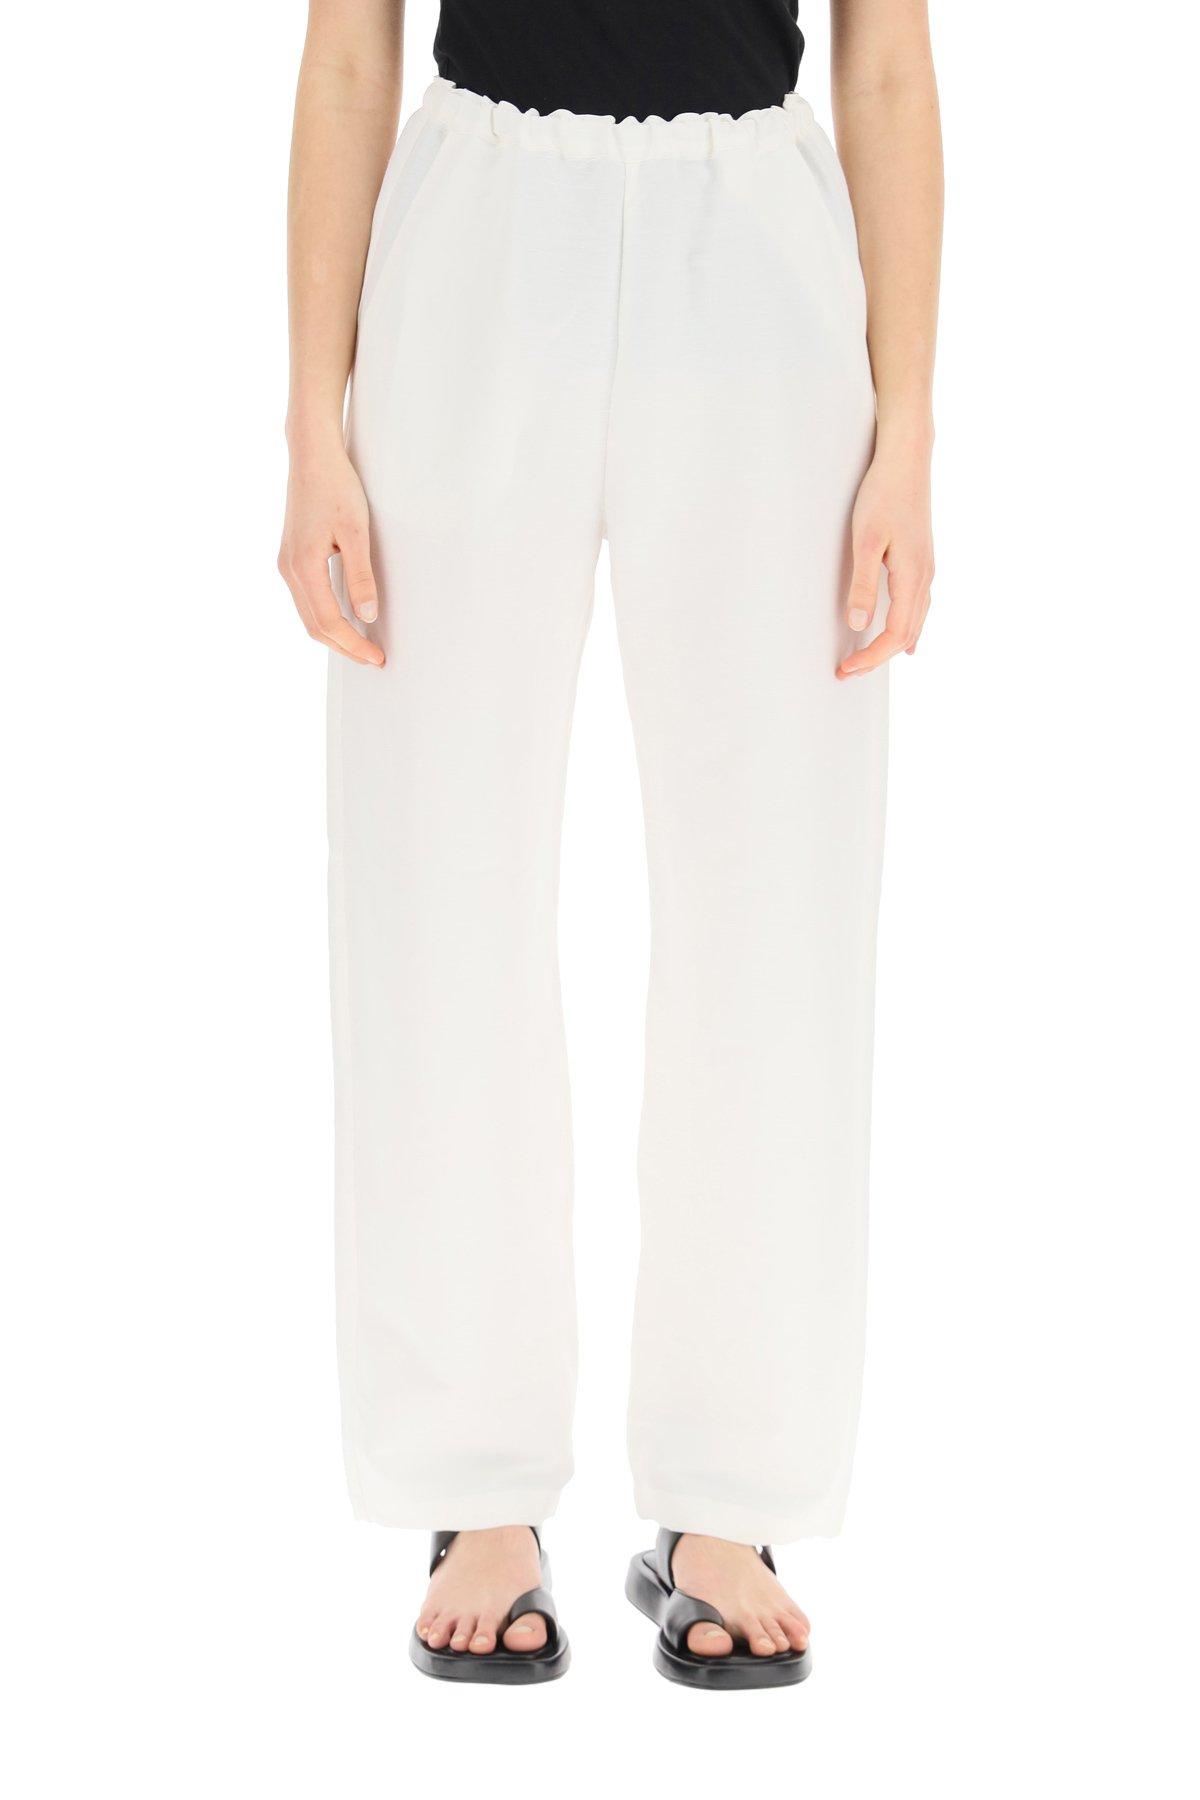 Toteme pantaloni larghi con elastico